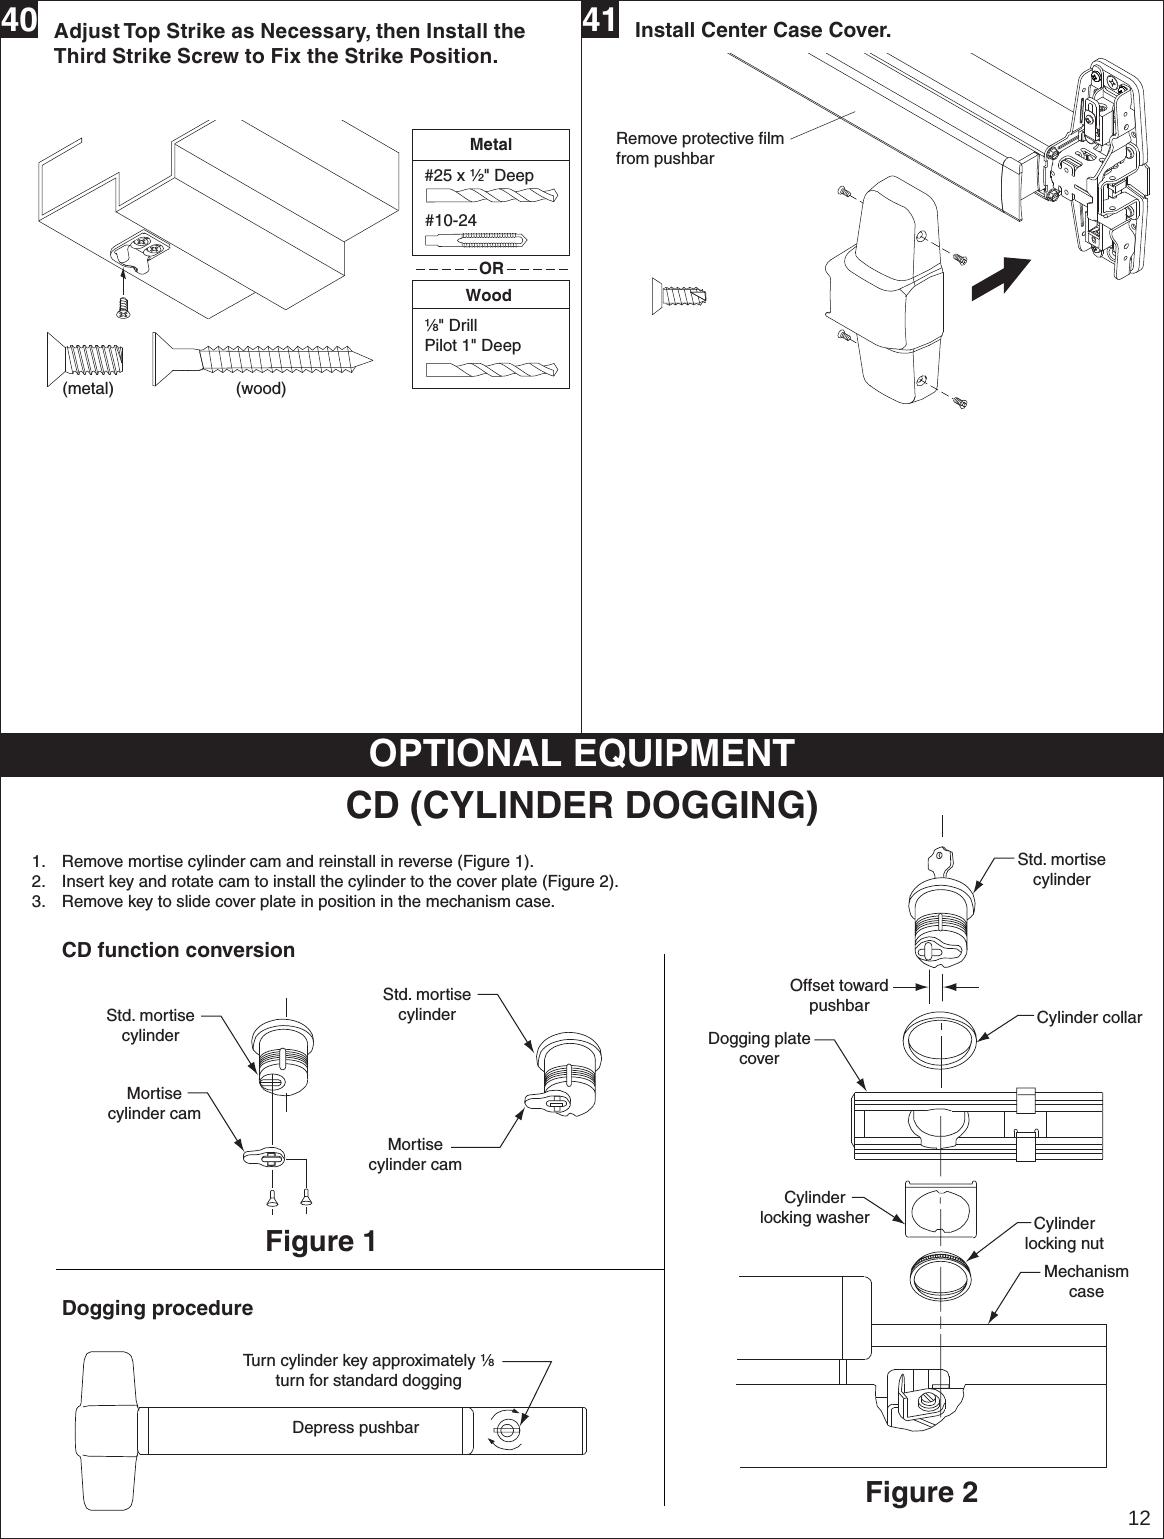 Von Duprin 23970734 G 98  9949 Metal Door Installation Instructions 105677